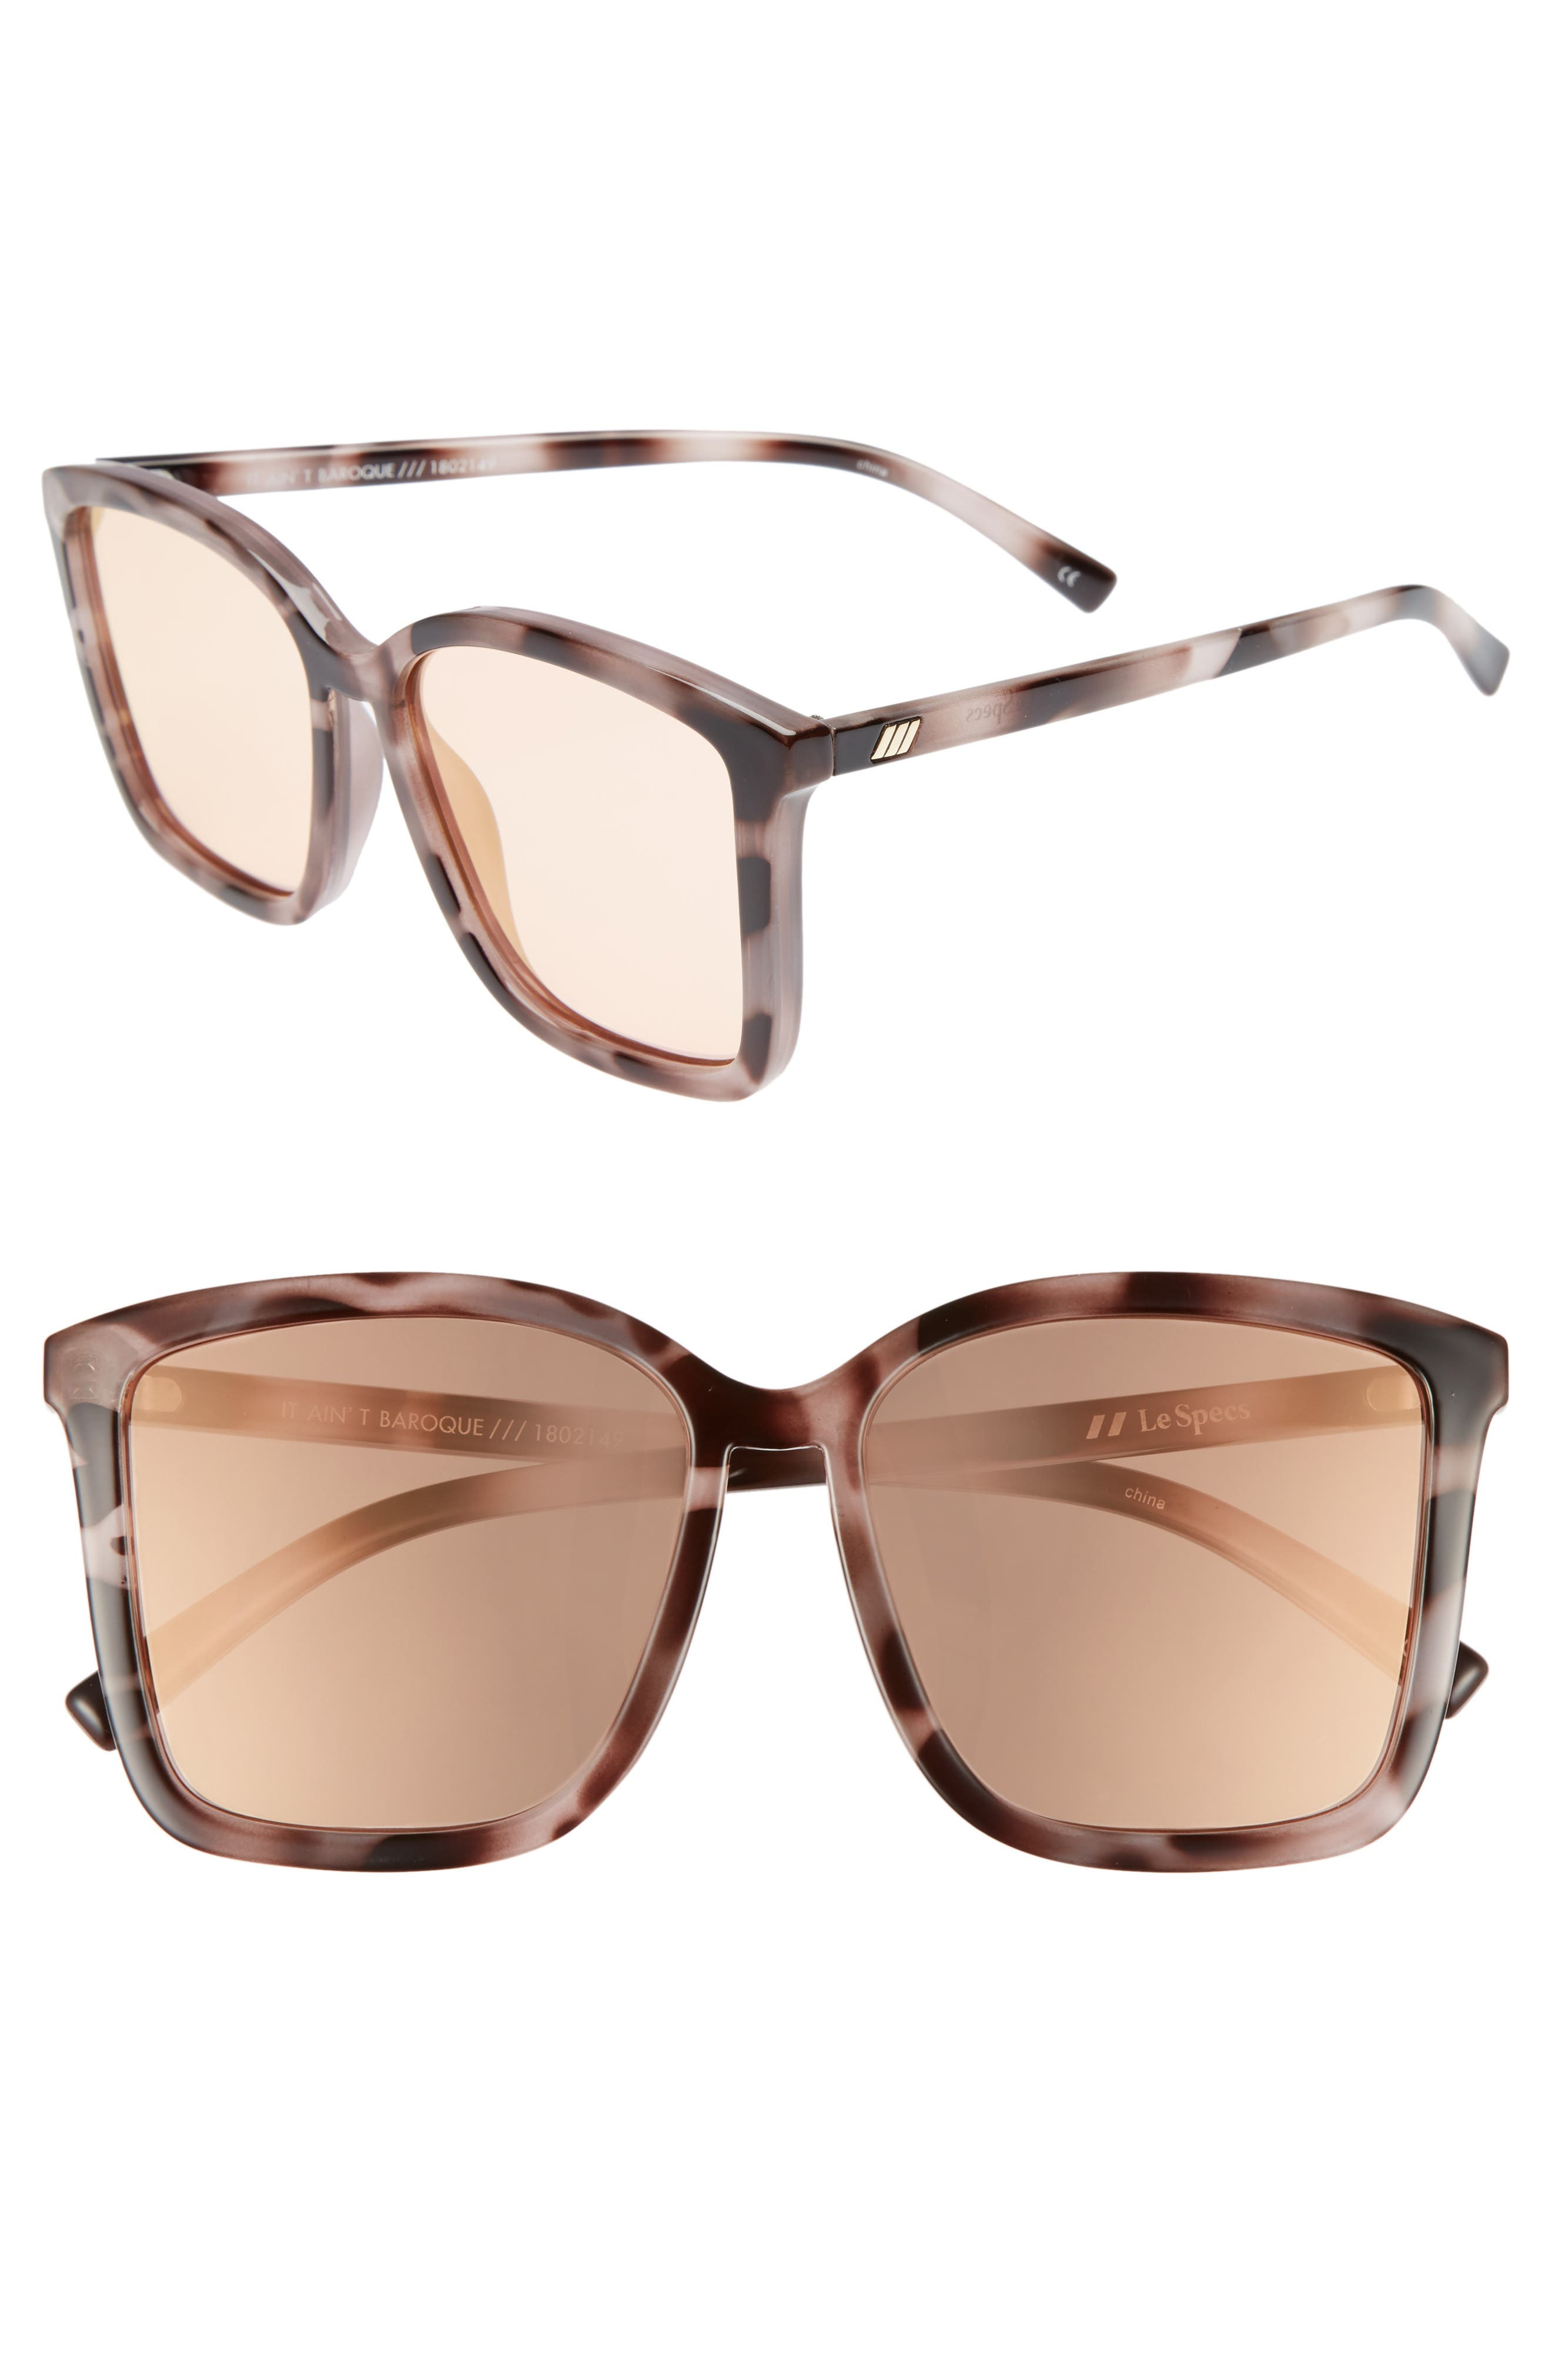 It Ain't Baroque 55mm Sunglasses,                         Main,                         color, APRICOT TORT